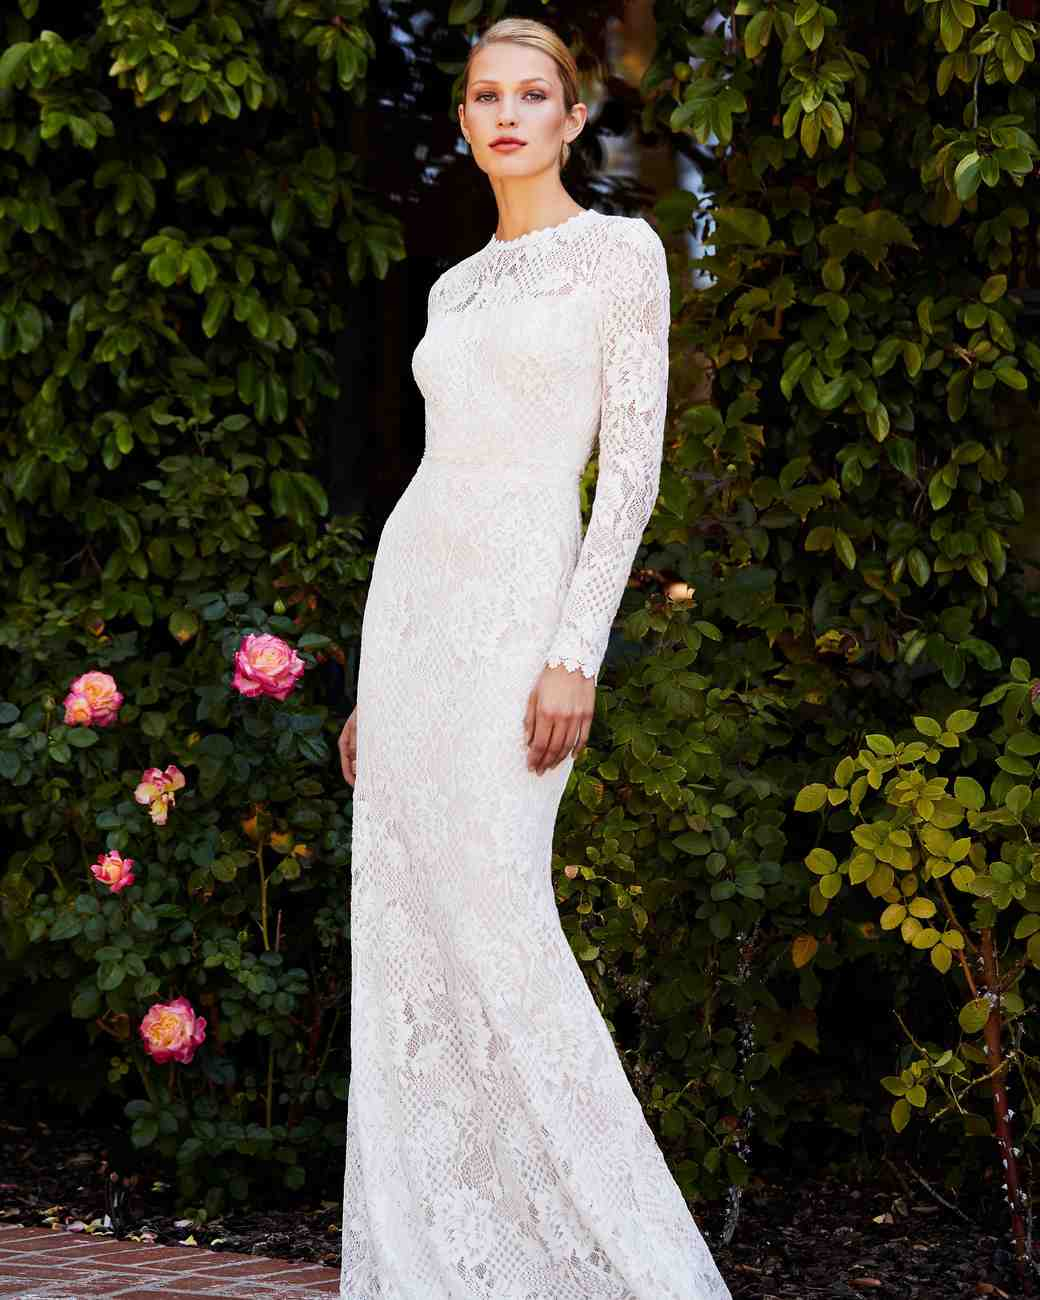 Wedding dresses with long sleeves 2018 nba